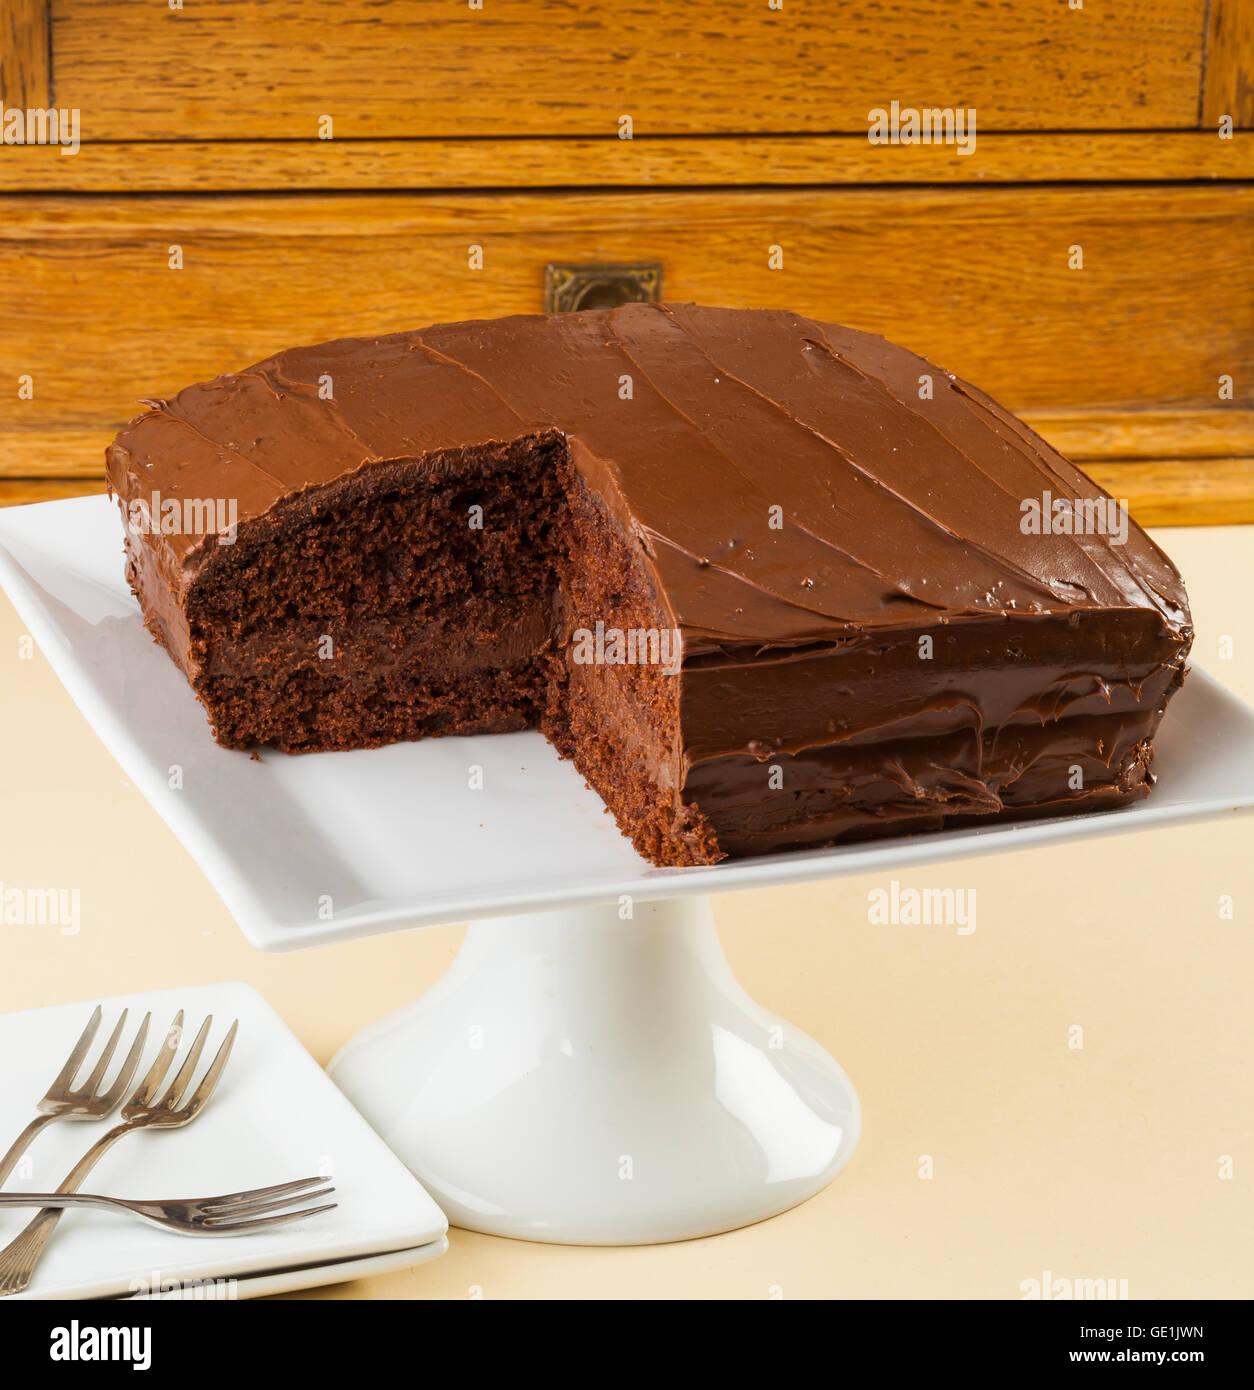 Australian chocolate layer cake. - Stock Image